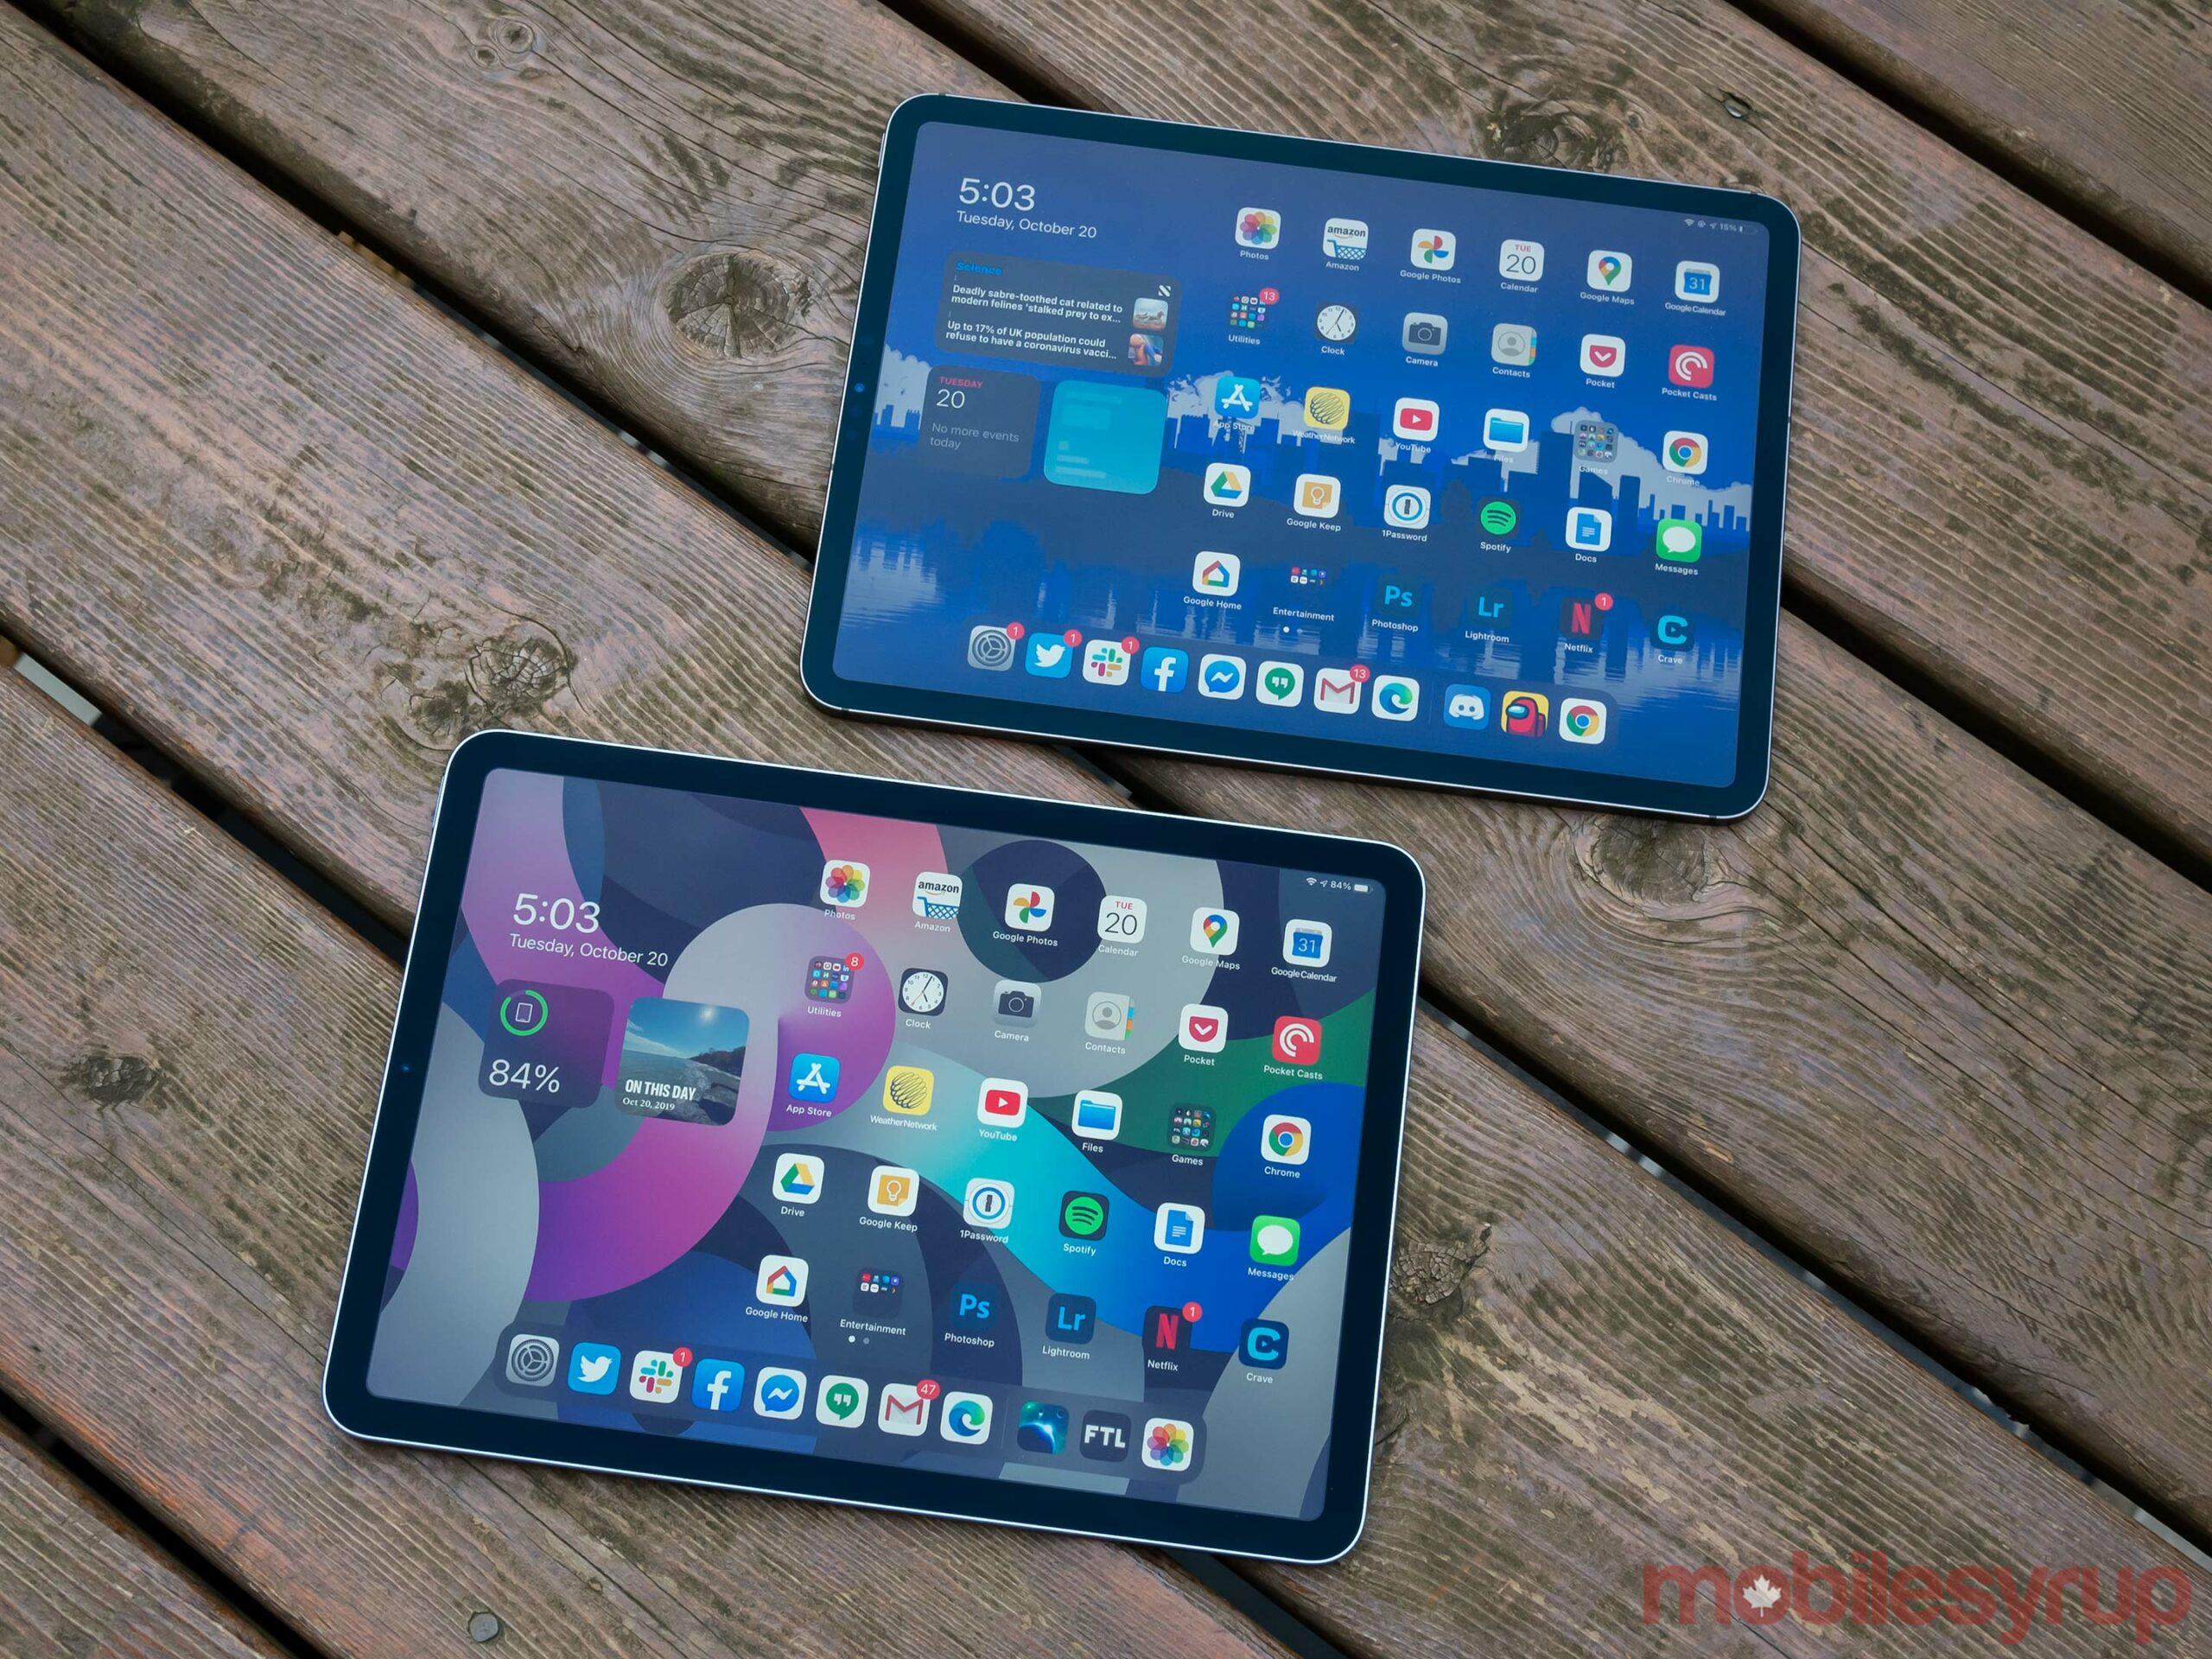 iPad Air (2020) vs iPad Pro (2020)